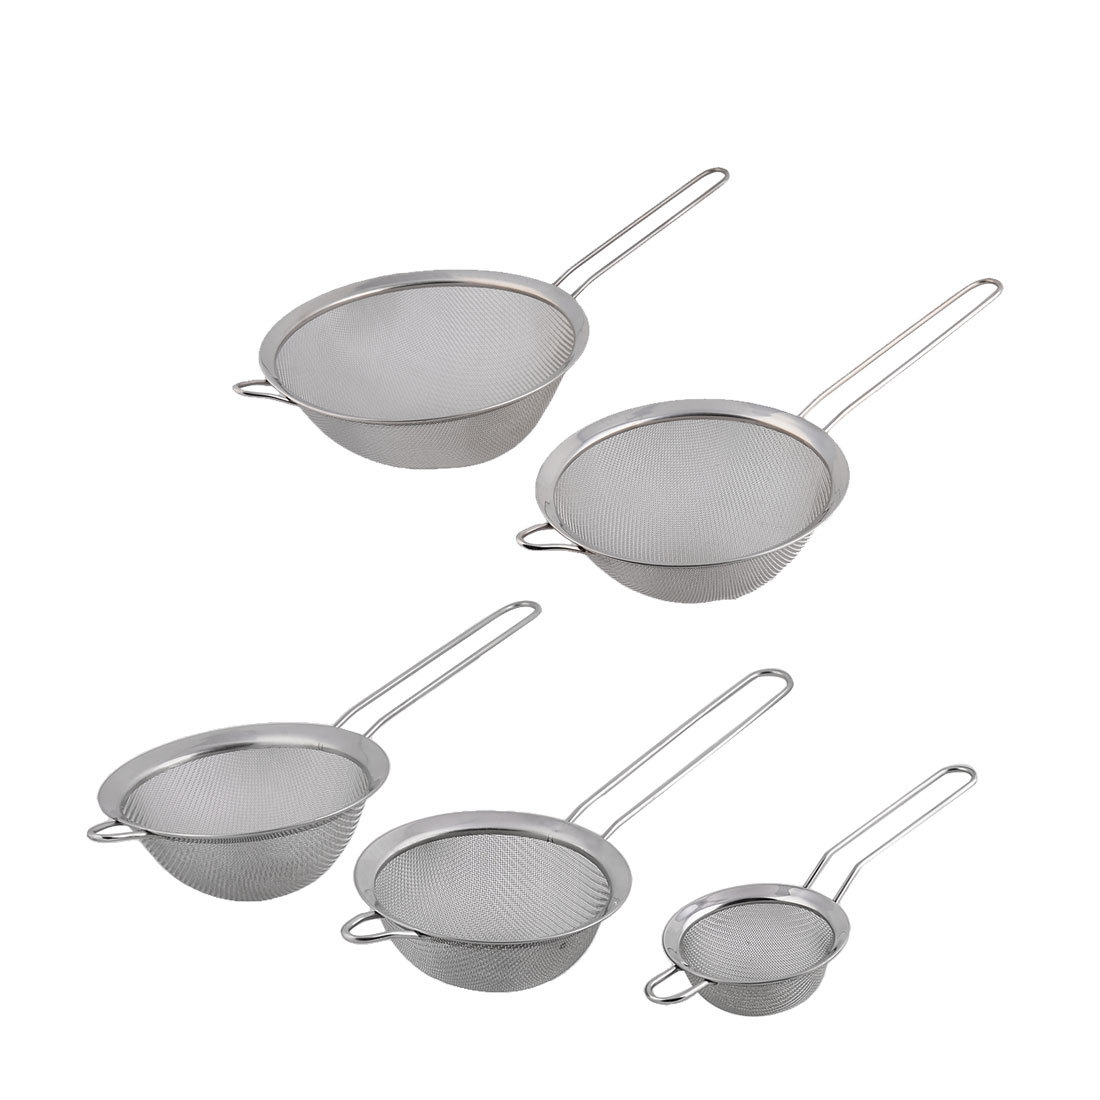 Kitchen Cookware Chef Metal Oil Flour Mesh Strainer Colander Sieve Sifter 5 in 1 by Unique-Bargains